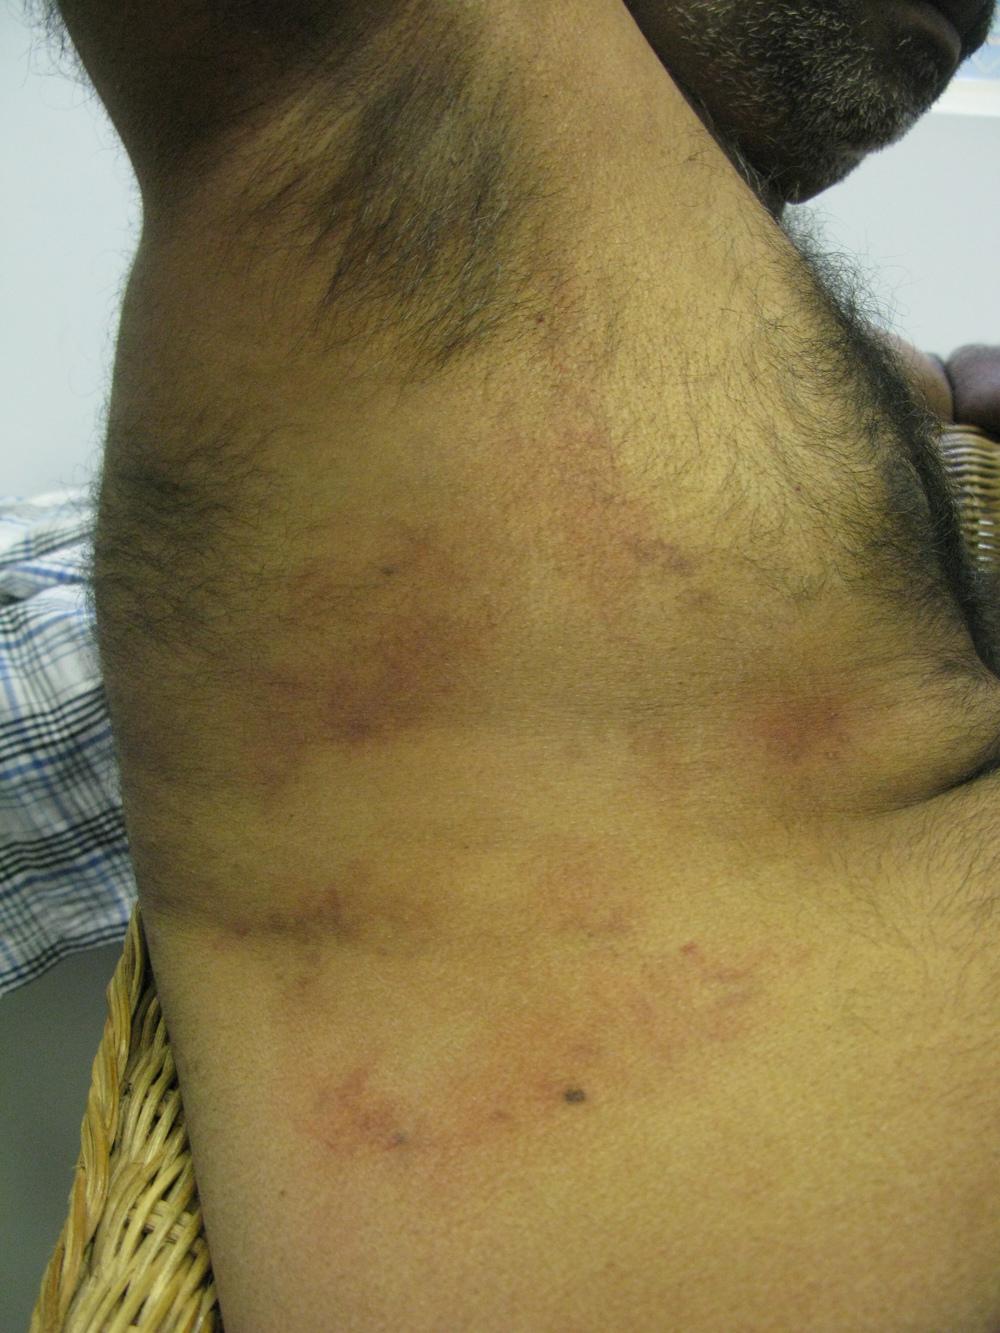 Bruising to Ribs